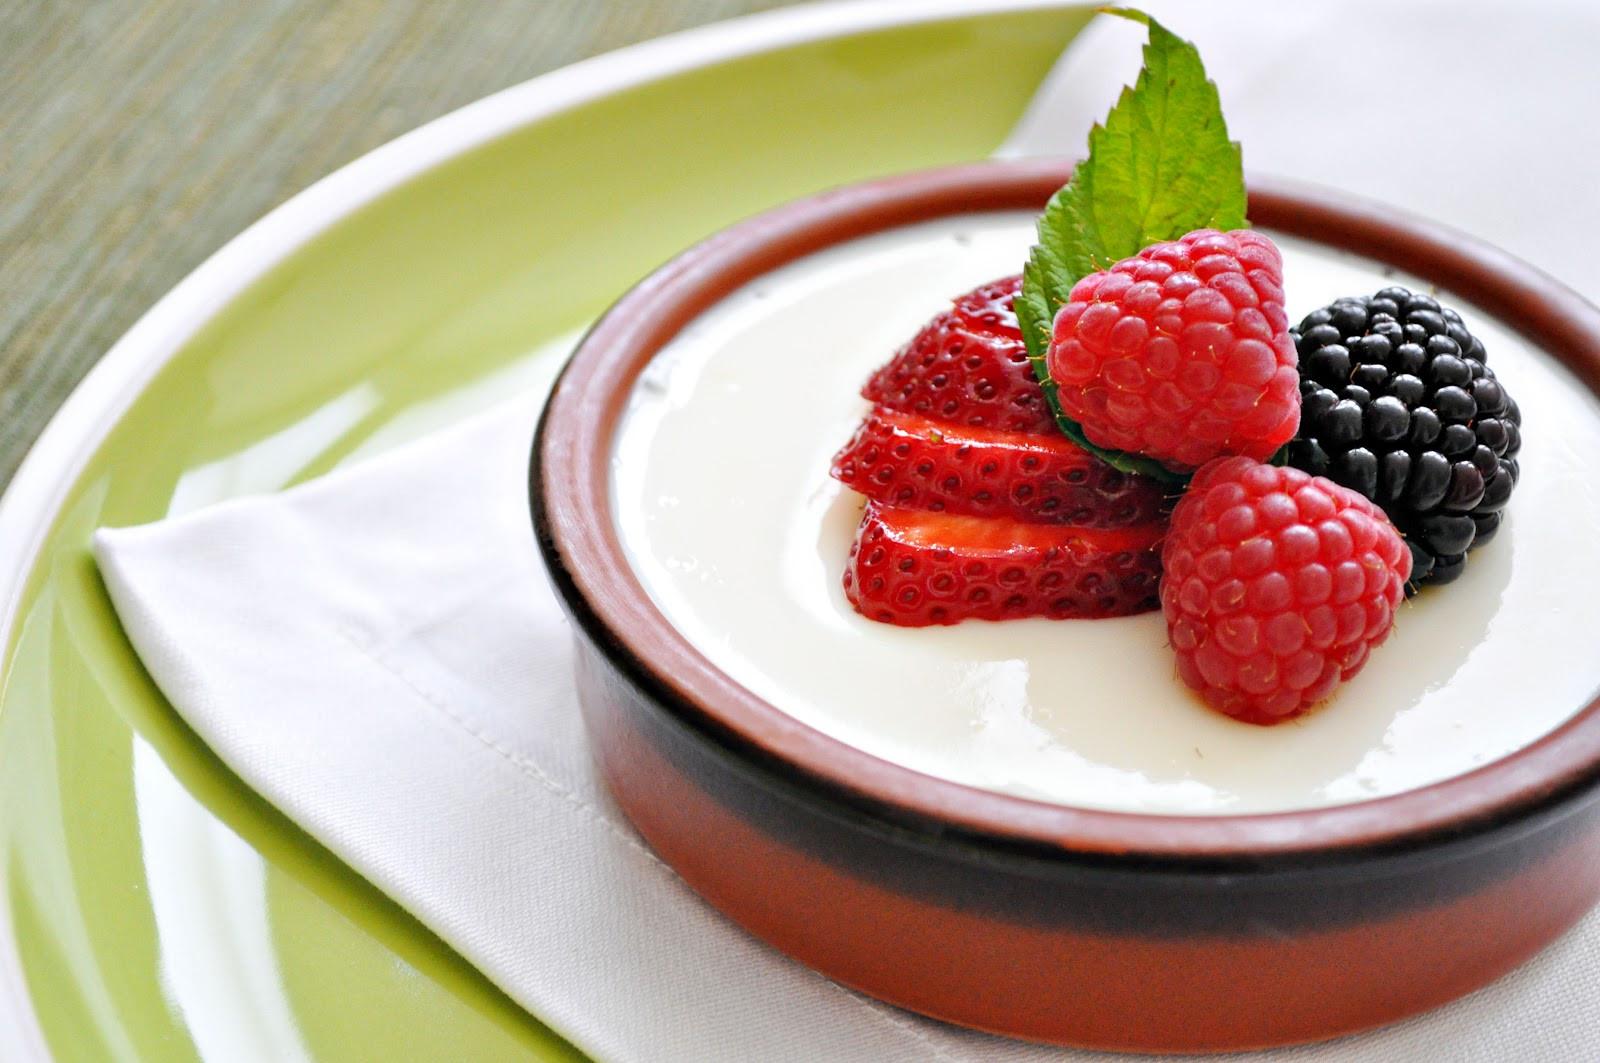 Panna Cotta Dessert  Eat Live Grow Paleo Food Medicine Gelatine for your Skin